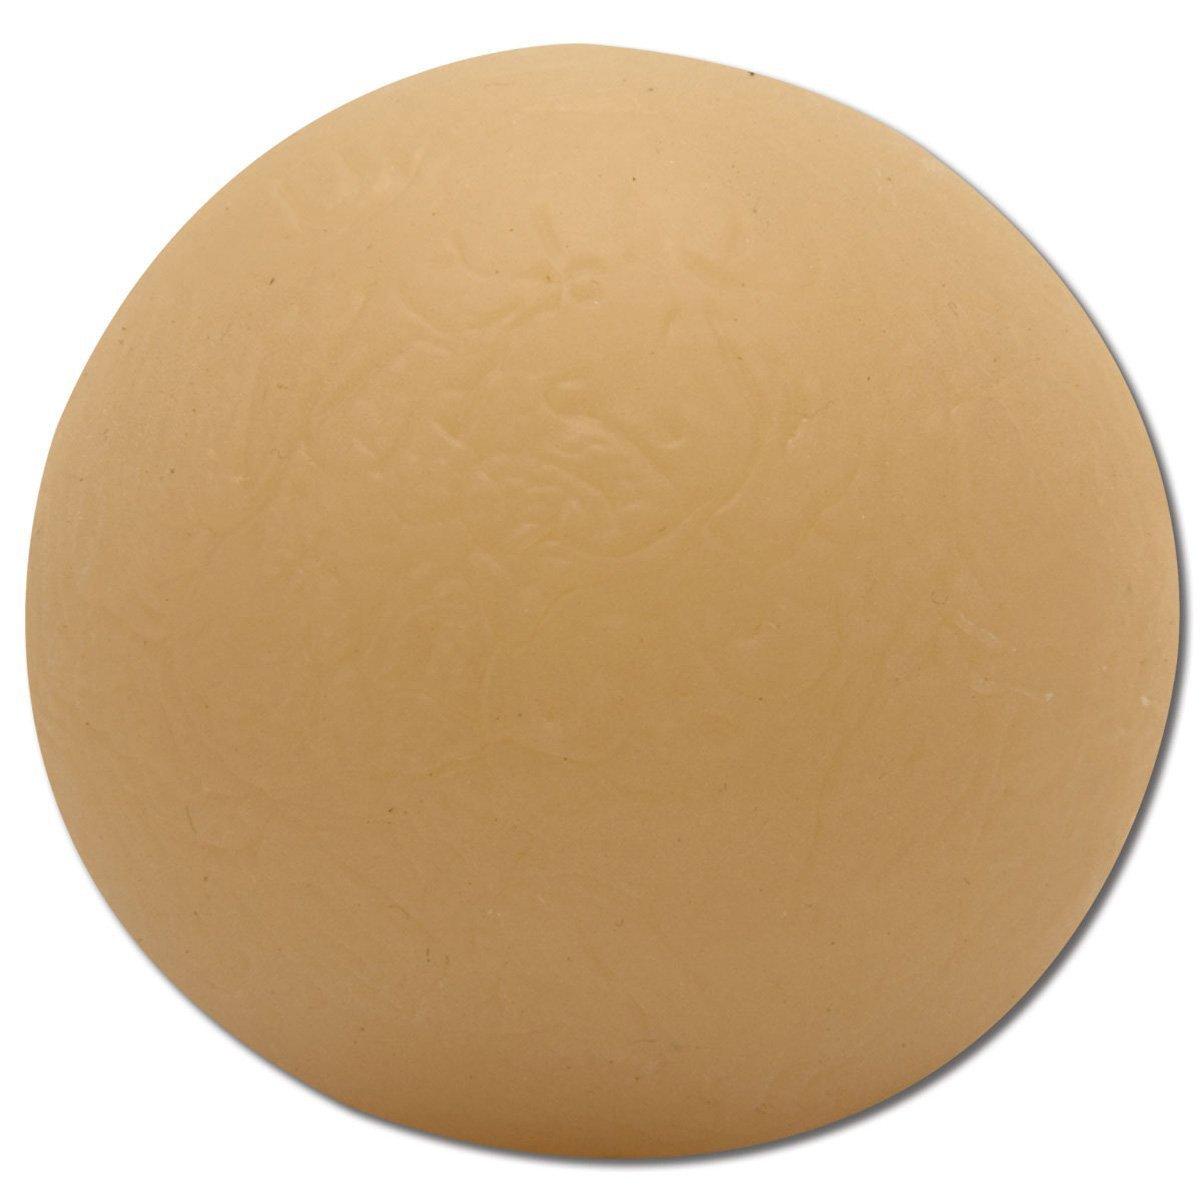 Fei 10–1490 Gel Hand Gymnastikball, Standard, tan, XX -